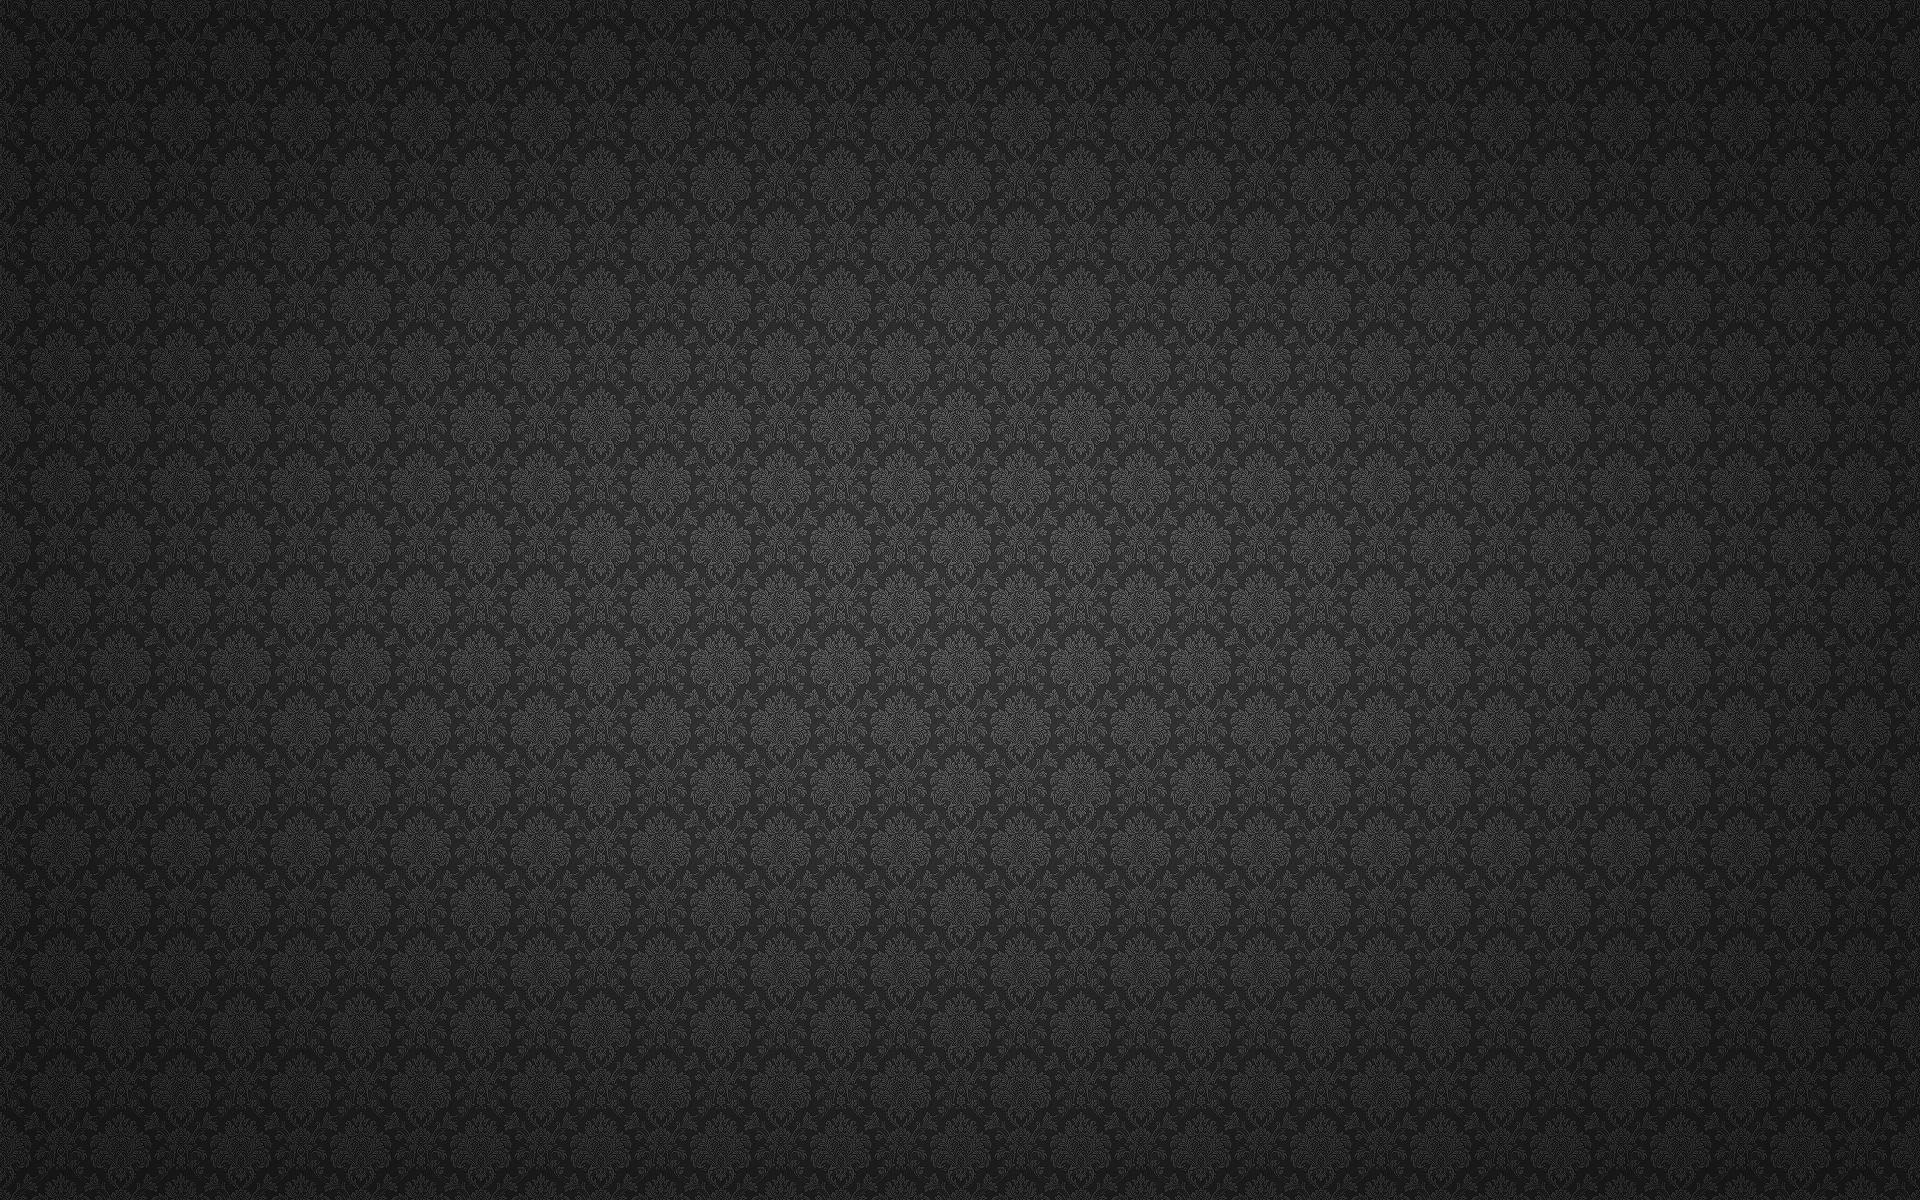 30 HD Black Wallpapers 1920x1200